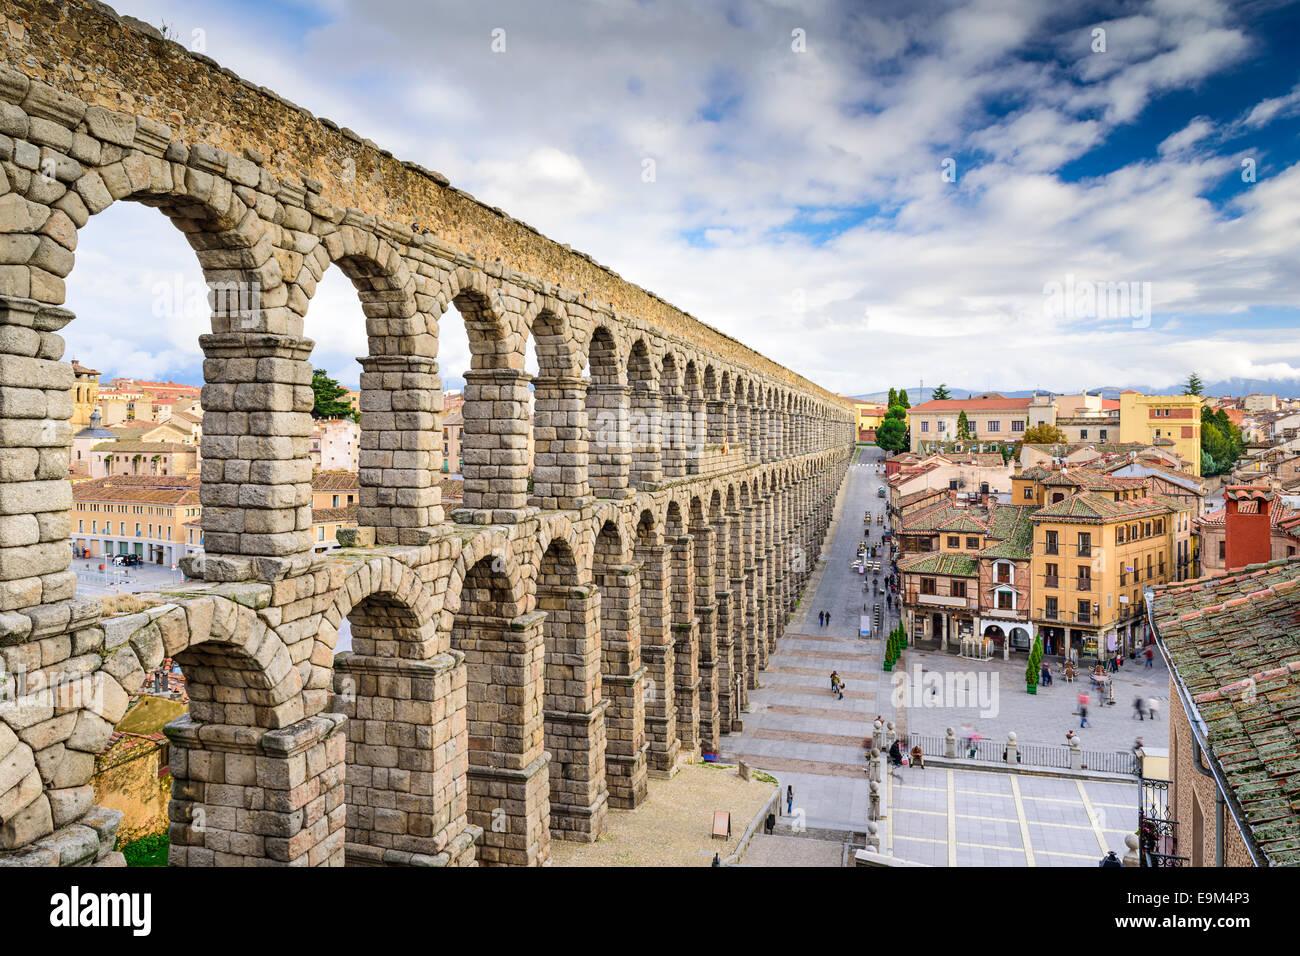 Segovia, Spain at the ancient Roman aqueduct. - Stock Image